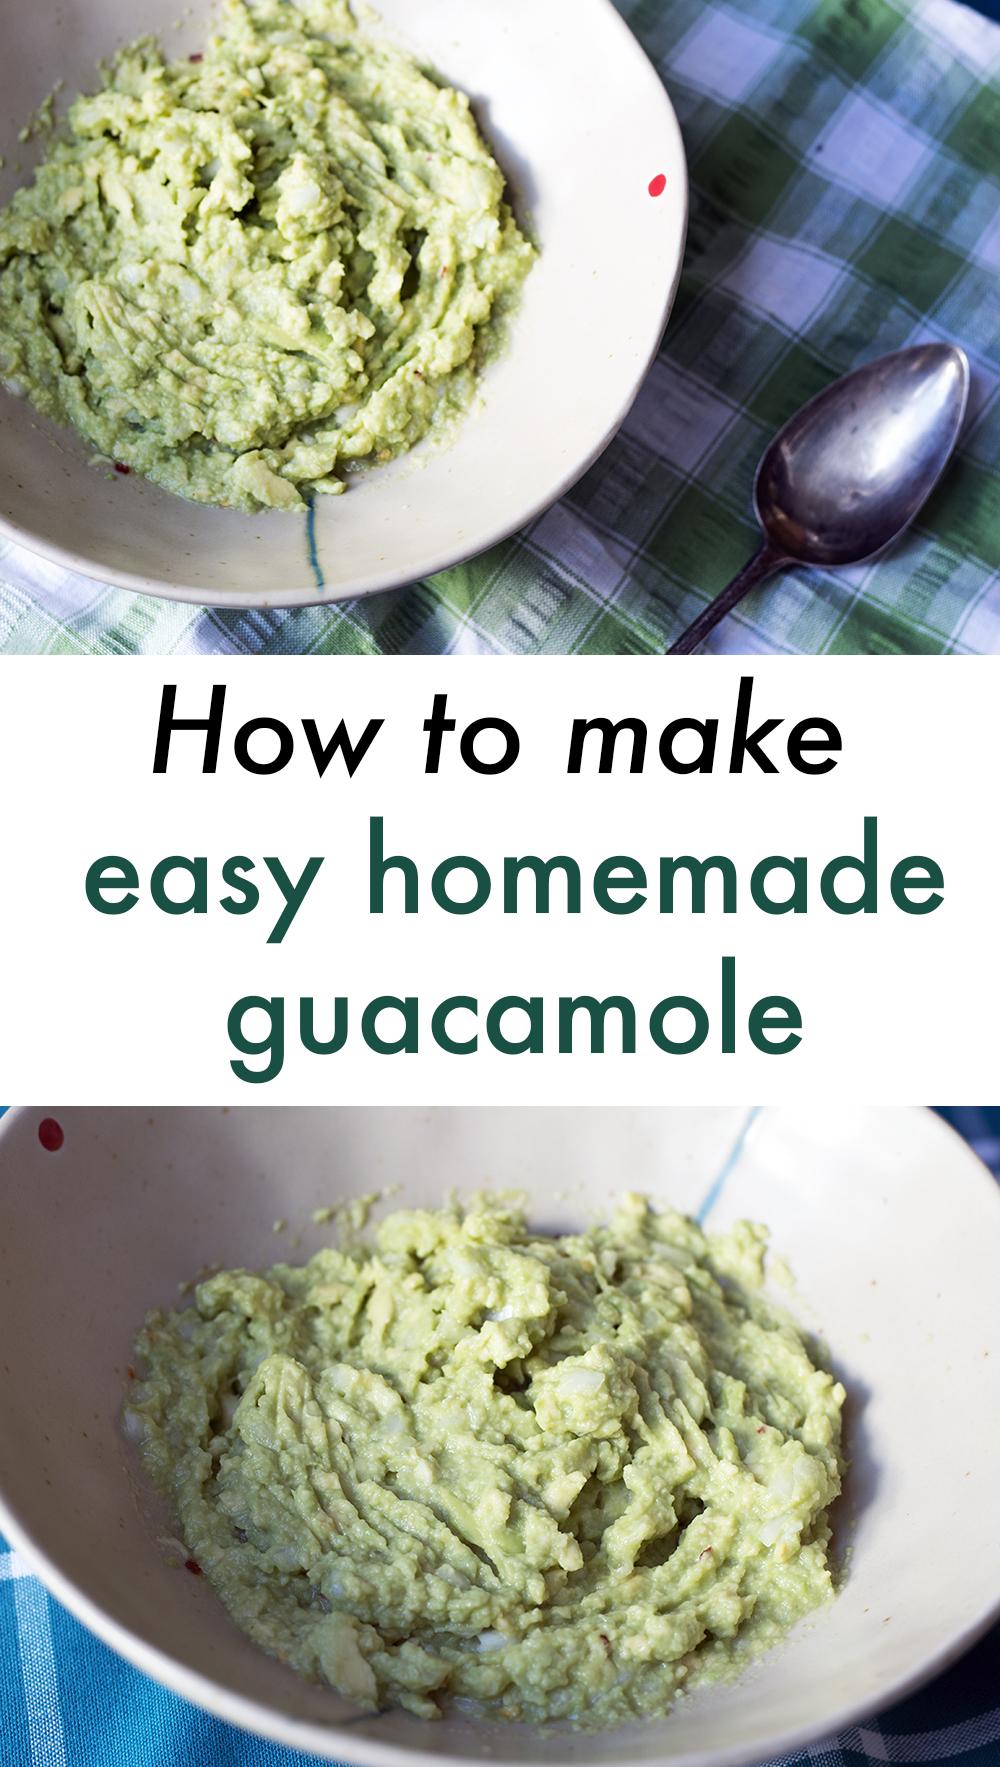 How-to-make-easy-homemade-guacamole